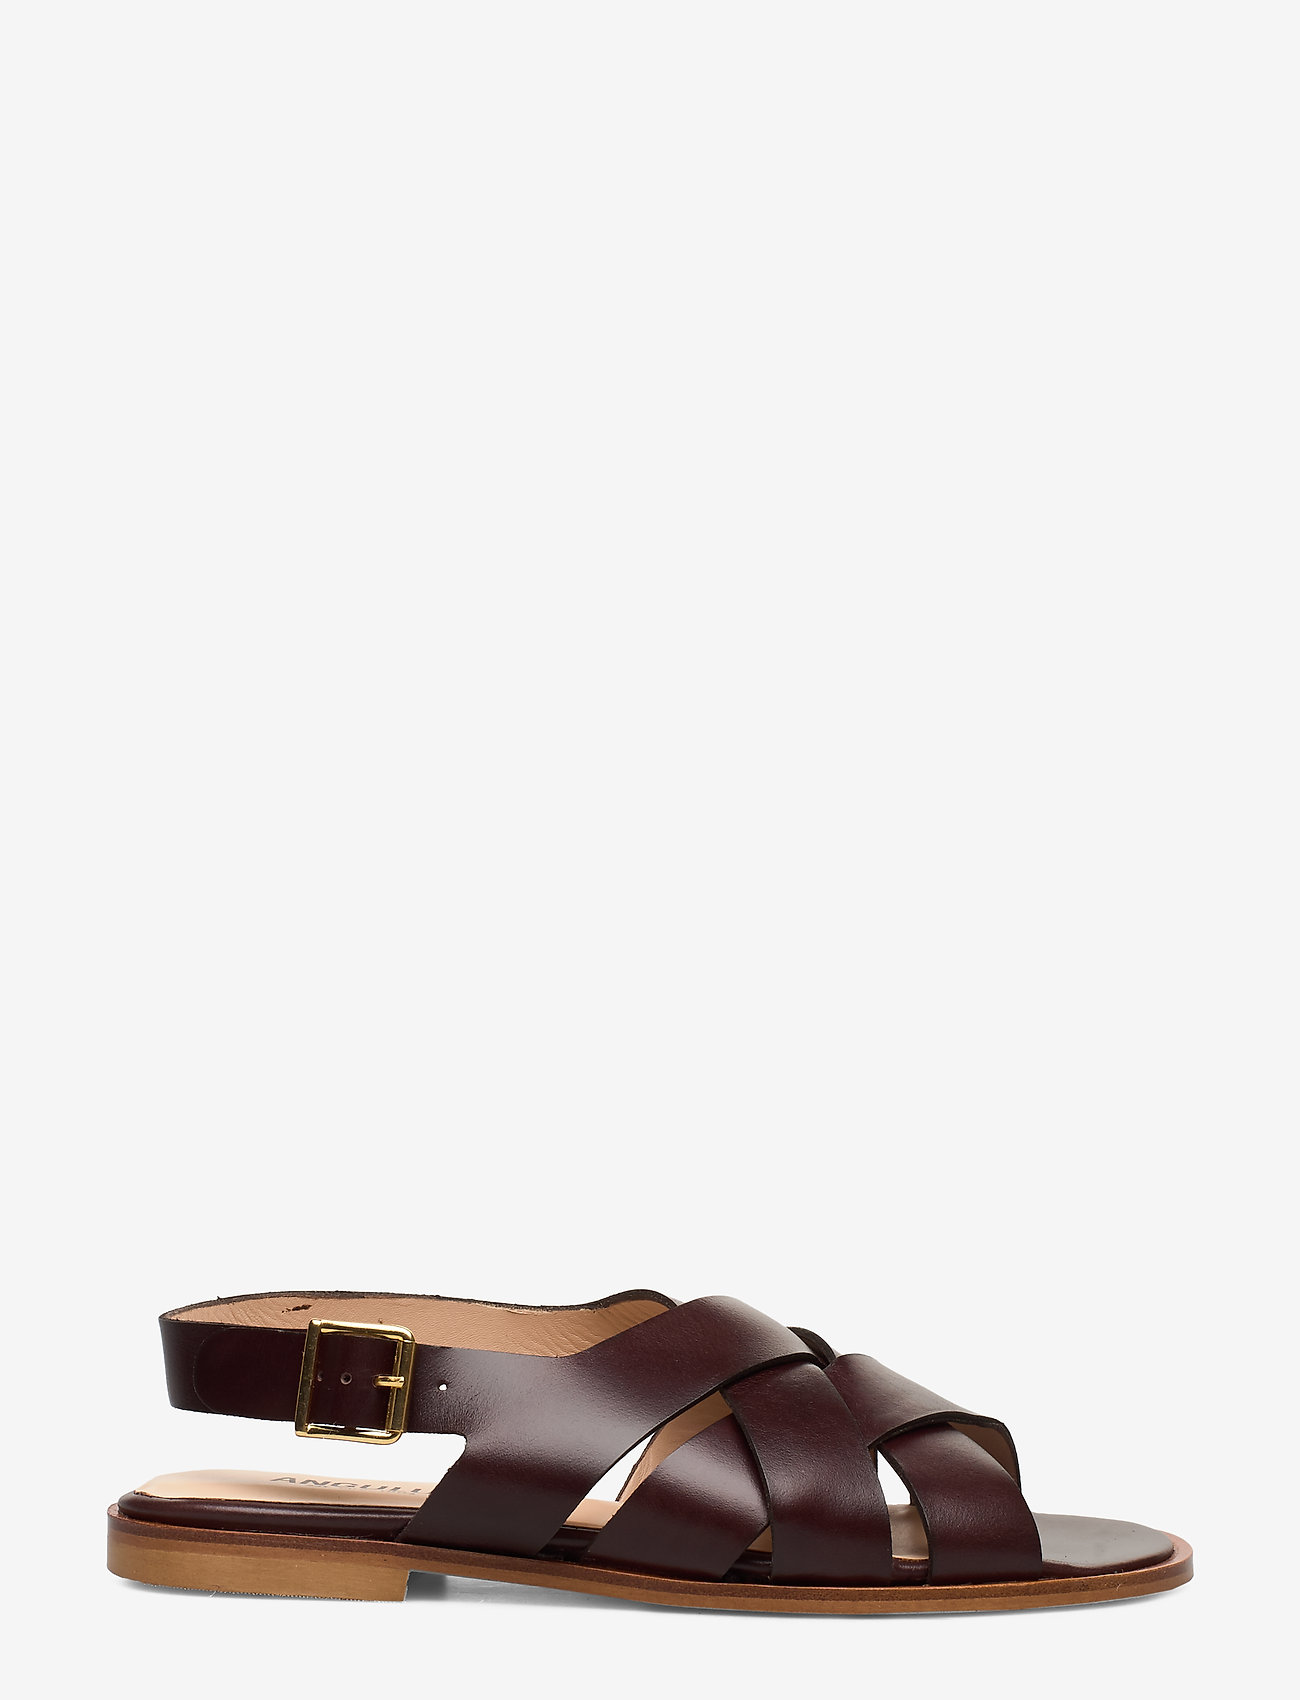 ANGULUS - Sandals - flat - open toe - op - flache sandalen - 1836 dark brown - 1